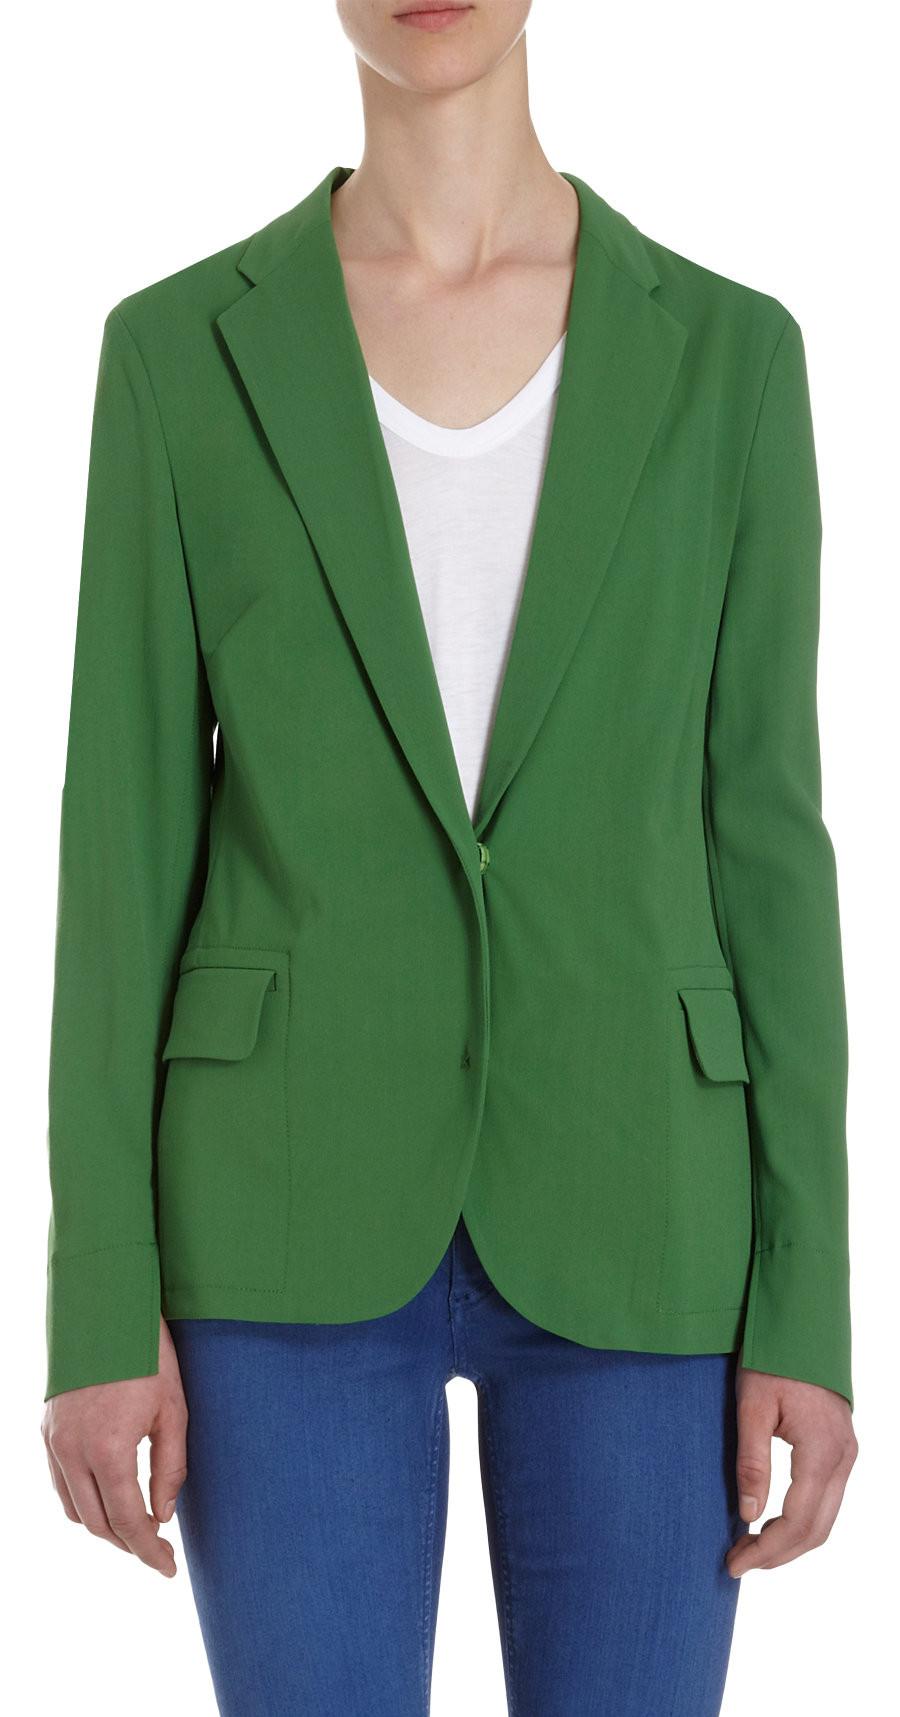 Acne blazer, $159 (Photo: Barney's)